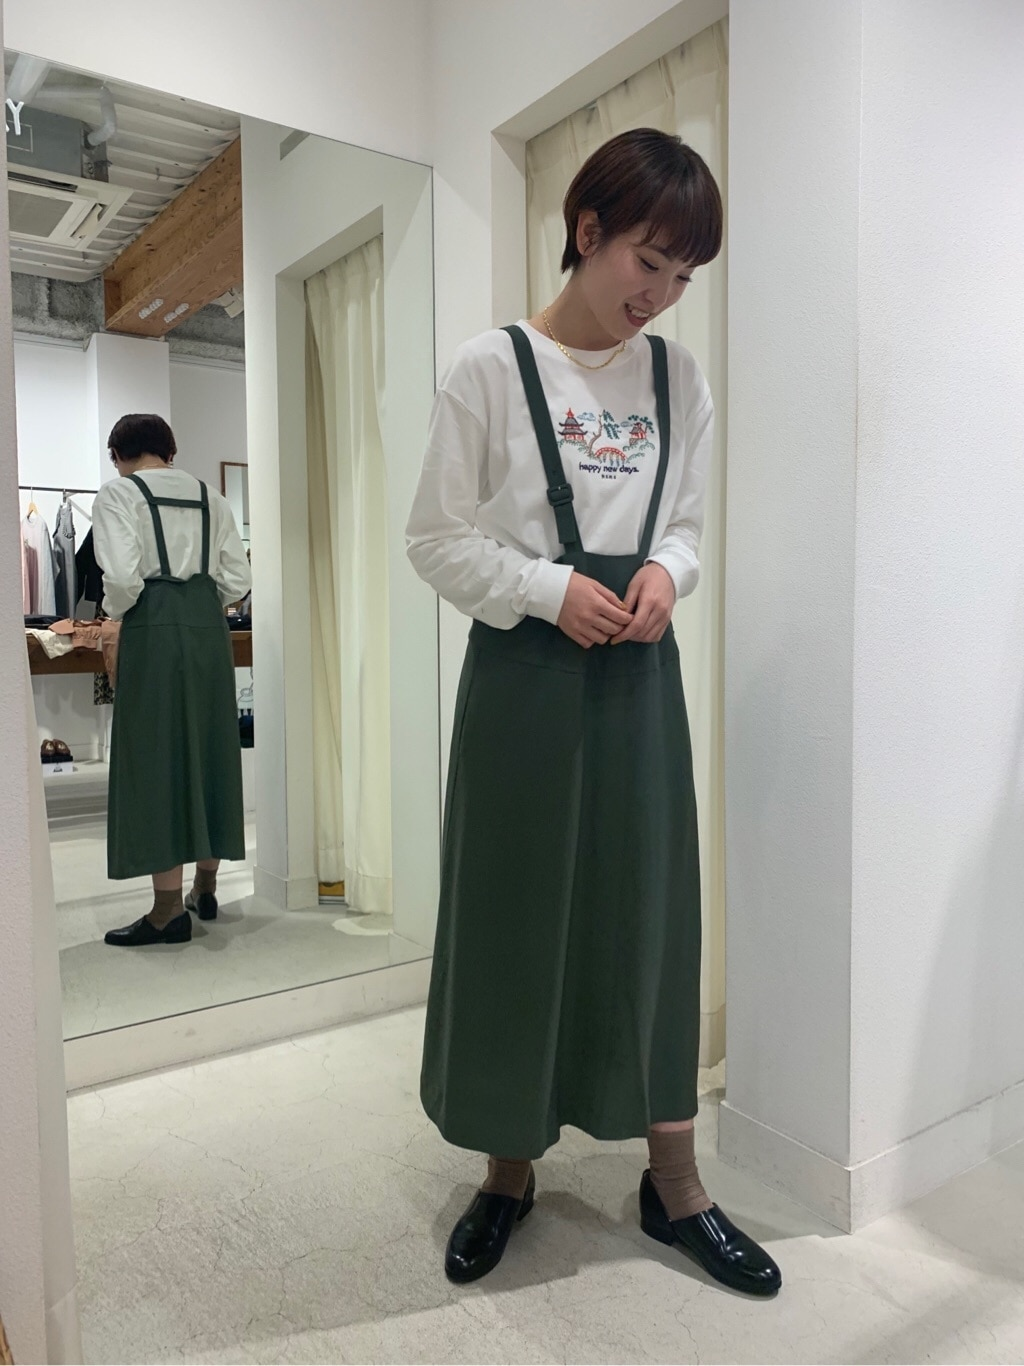 l'atelier du savon 名古屋栄路面 身長:161cm 2020.02.04